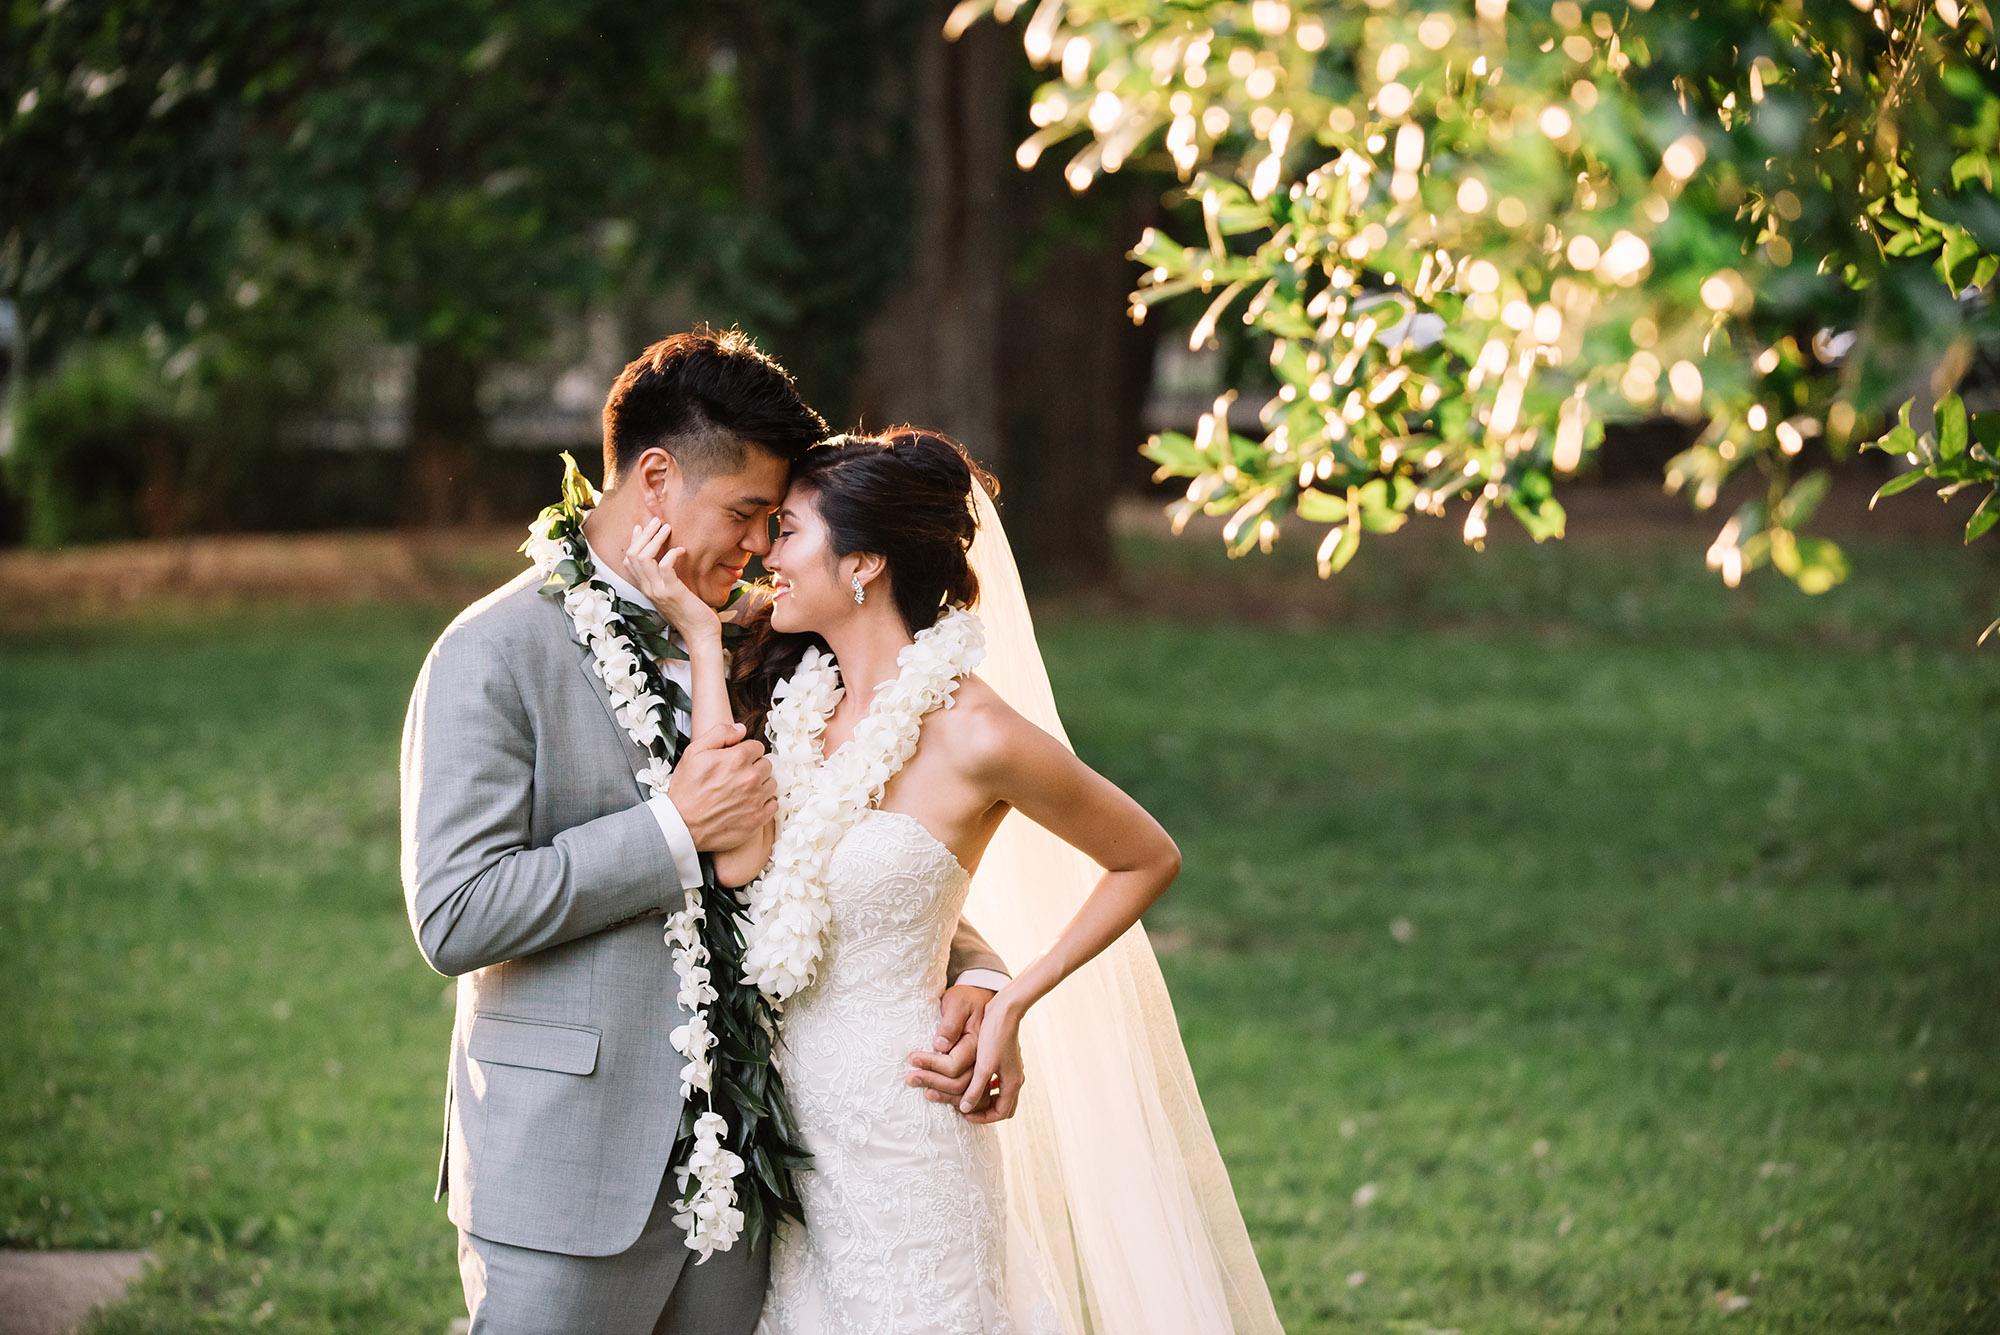 MICHELLE LINDSAY  Wedding photographer  EDITING LEVEL: BASIC / BASIC+ PRESET: Created by The Image Salon WE EDIT: Full galleries + Portfolio.